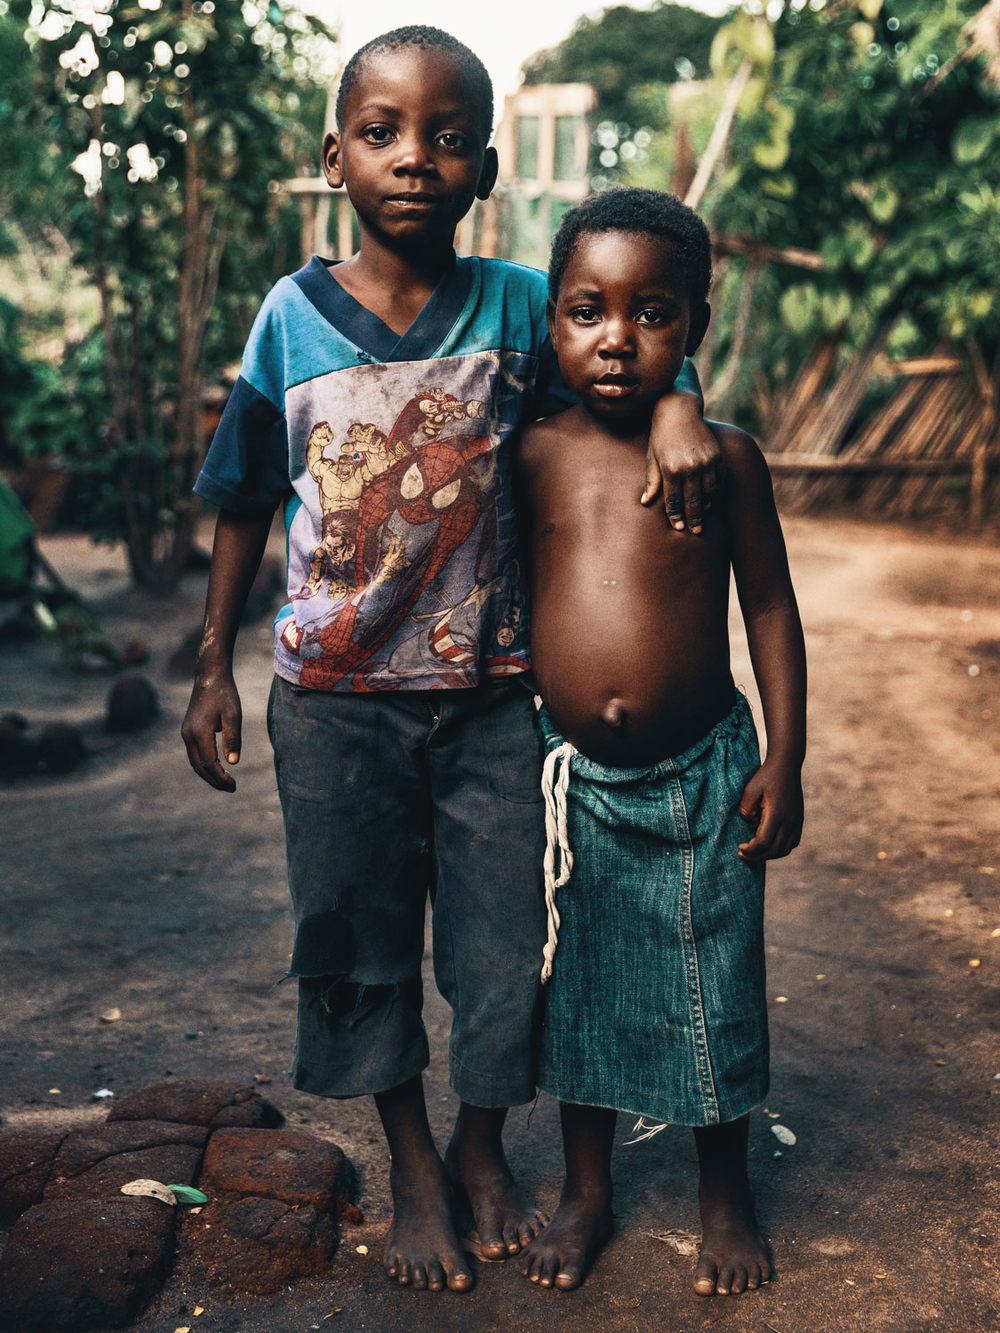 CallieGiovanna_Africa_Malawi_Chitimba_20150101_06326.jpg